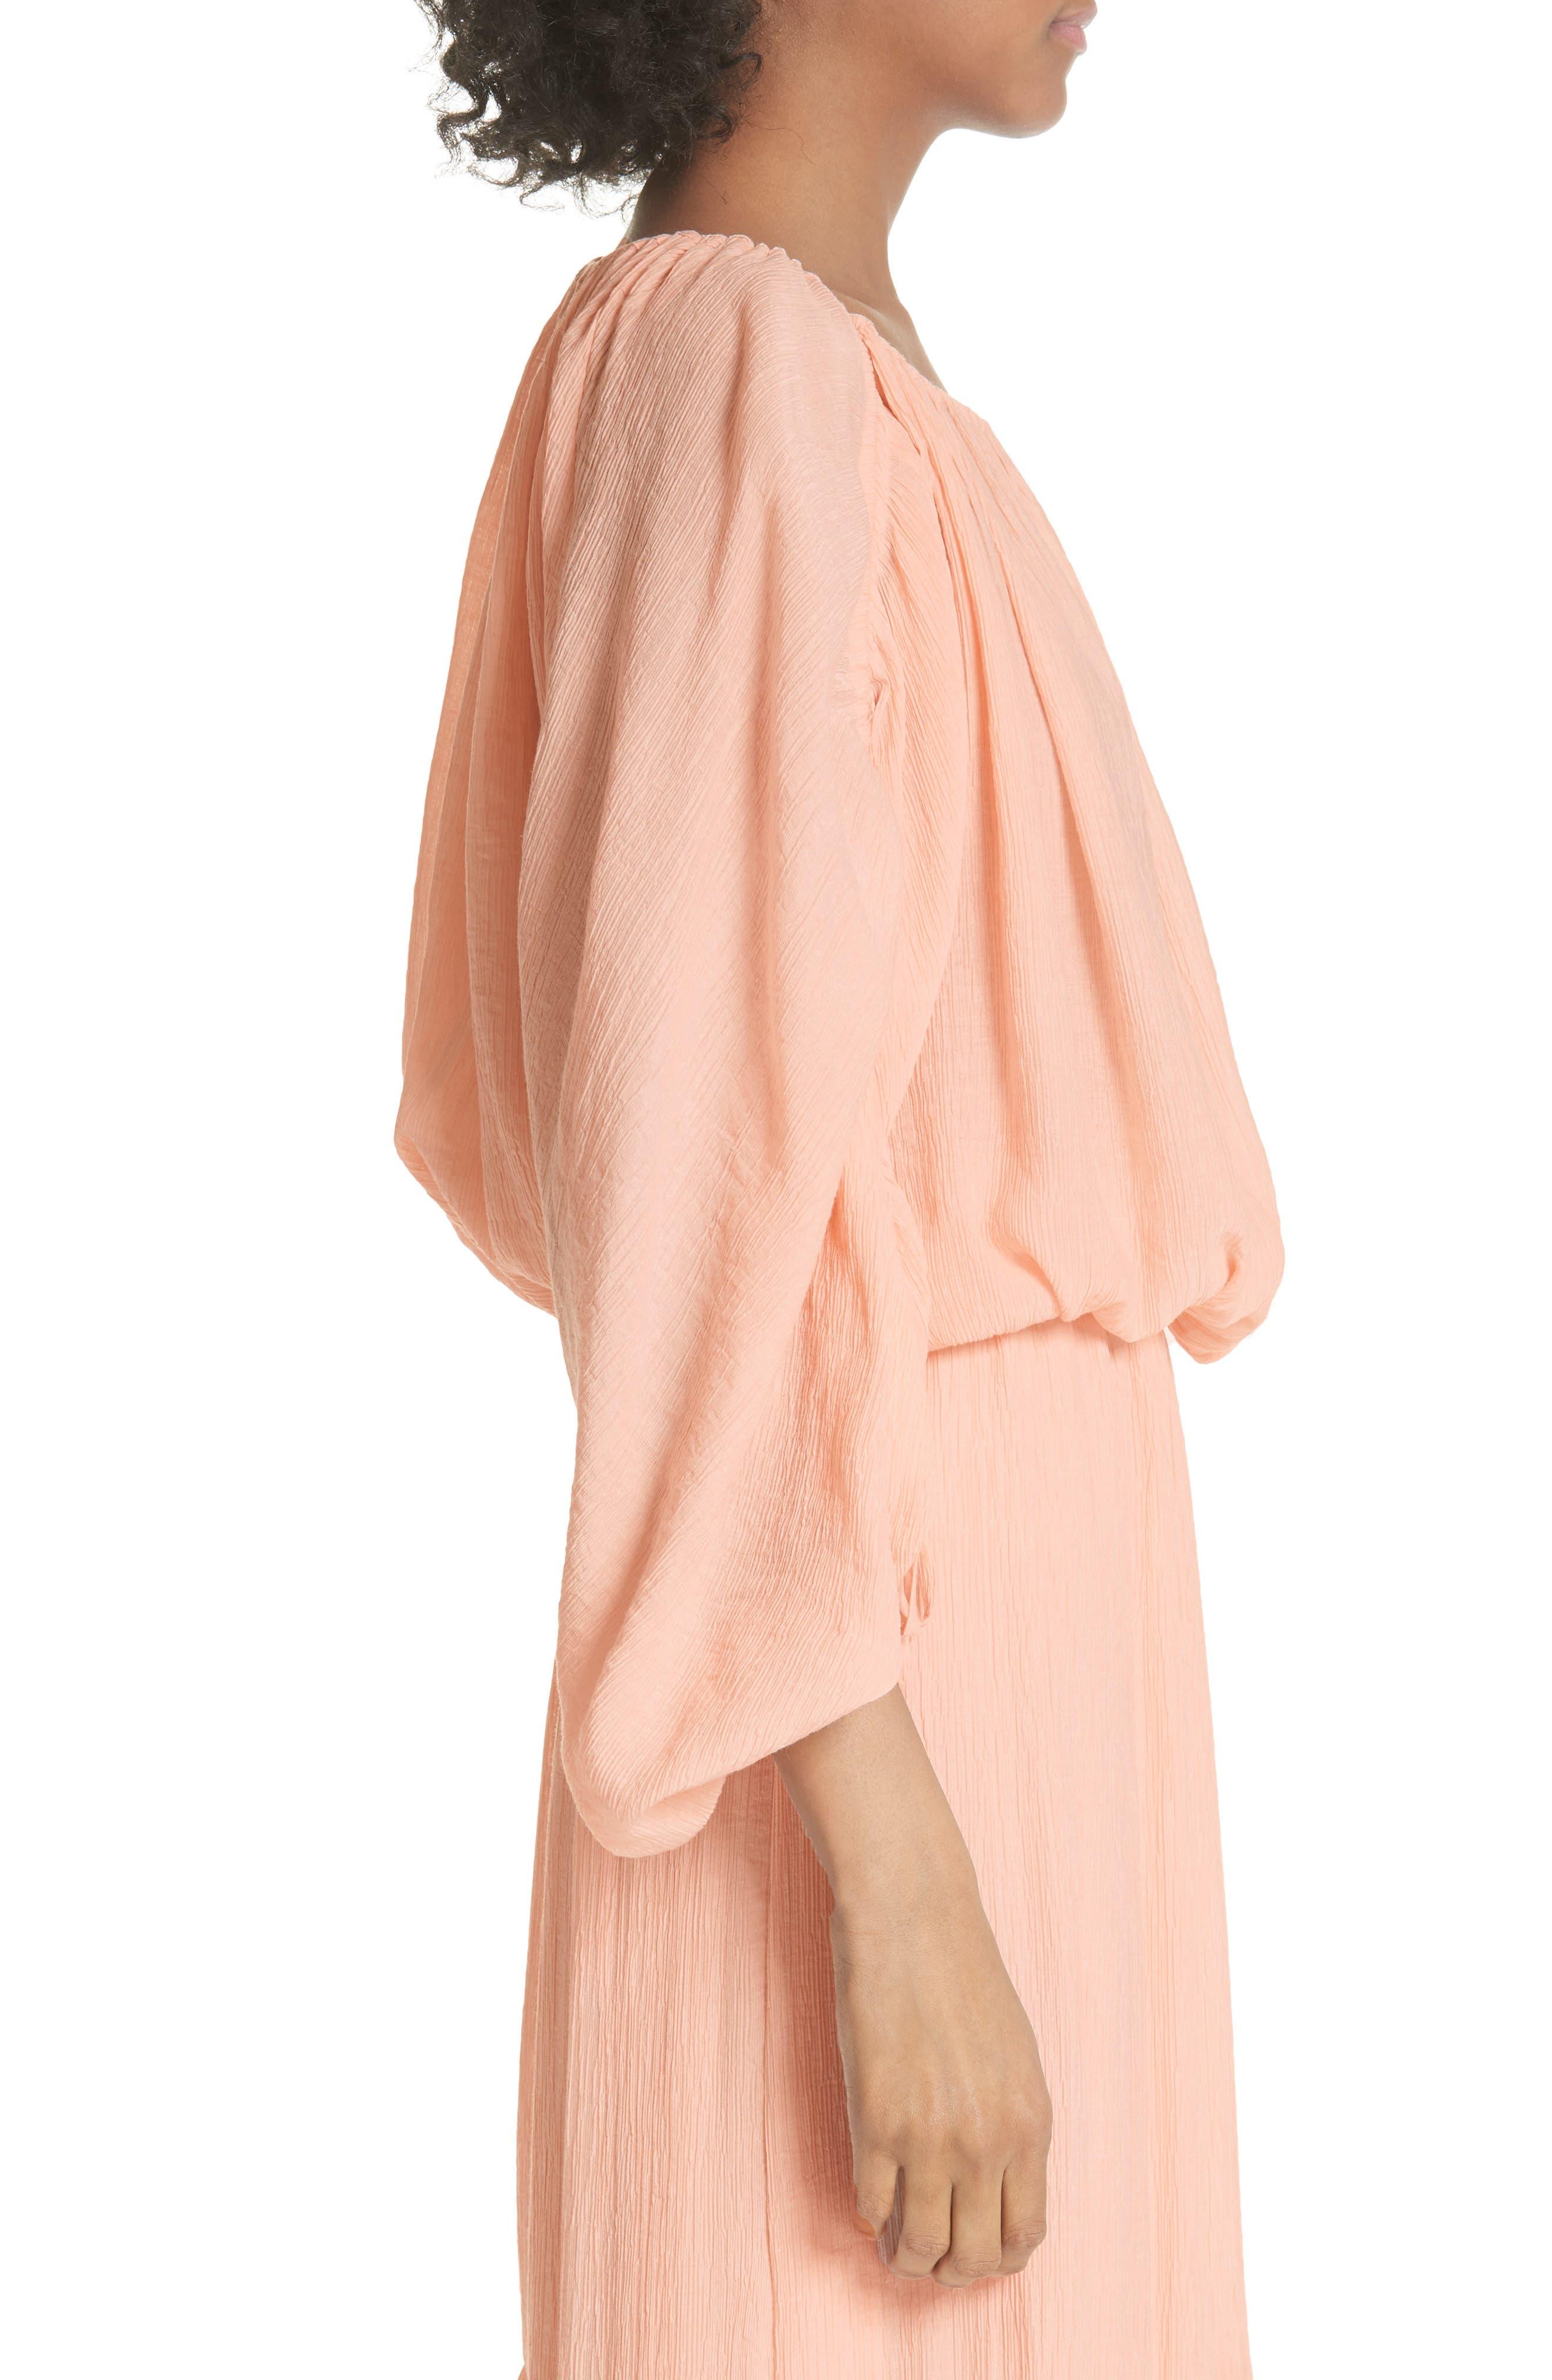 Elazara Ruched Sleeve Peasant Top,                             Alternate thumbnail 3, color,                             Summer Pink